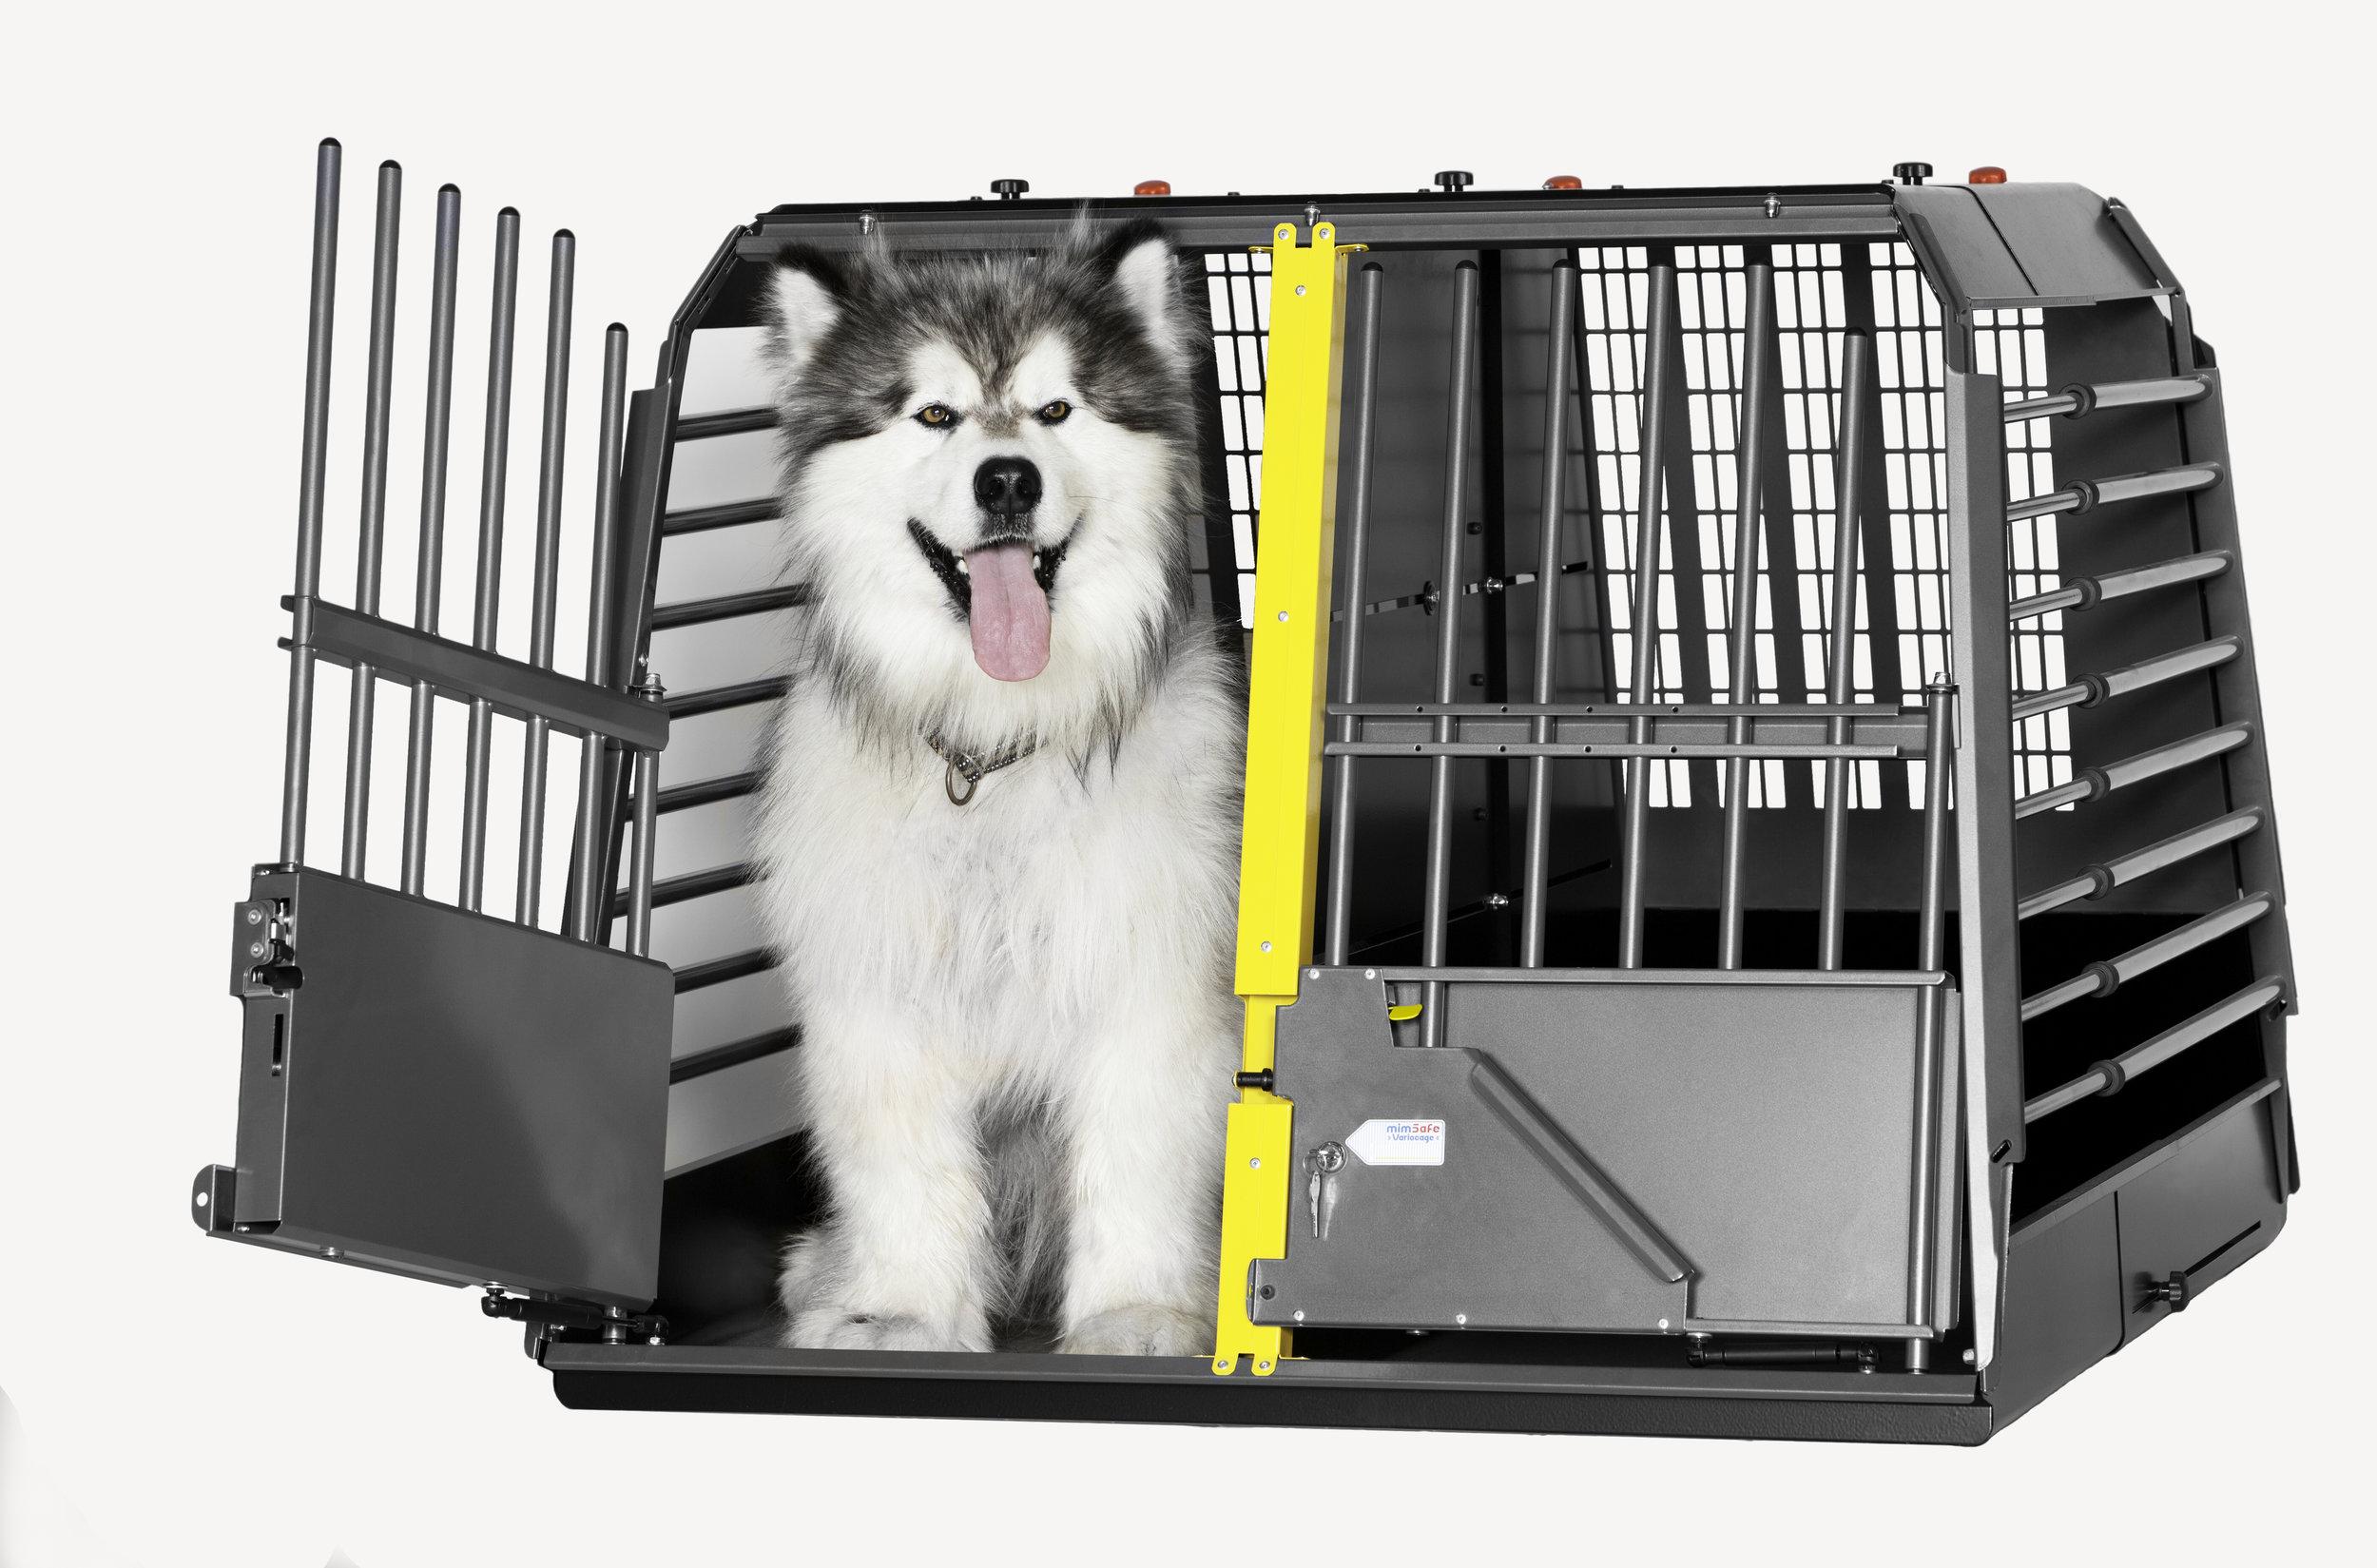 3G_variocage_maxiumum_dog in cage_dog_470x310mm_print.jpg